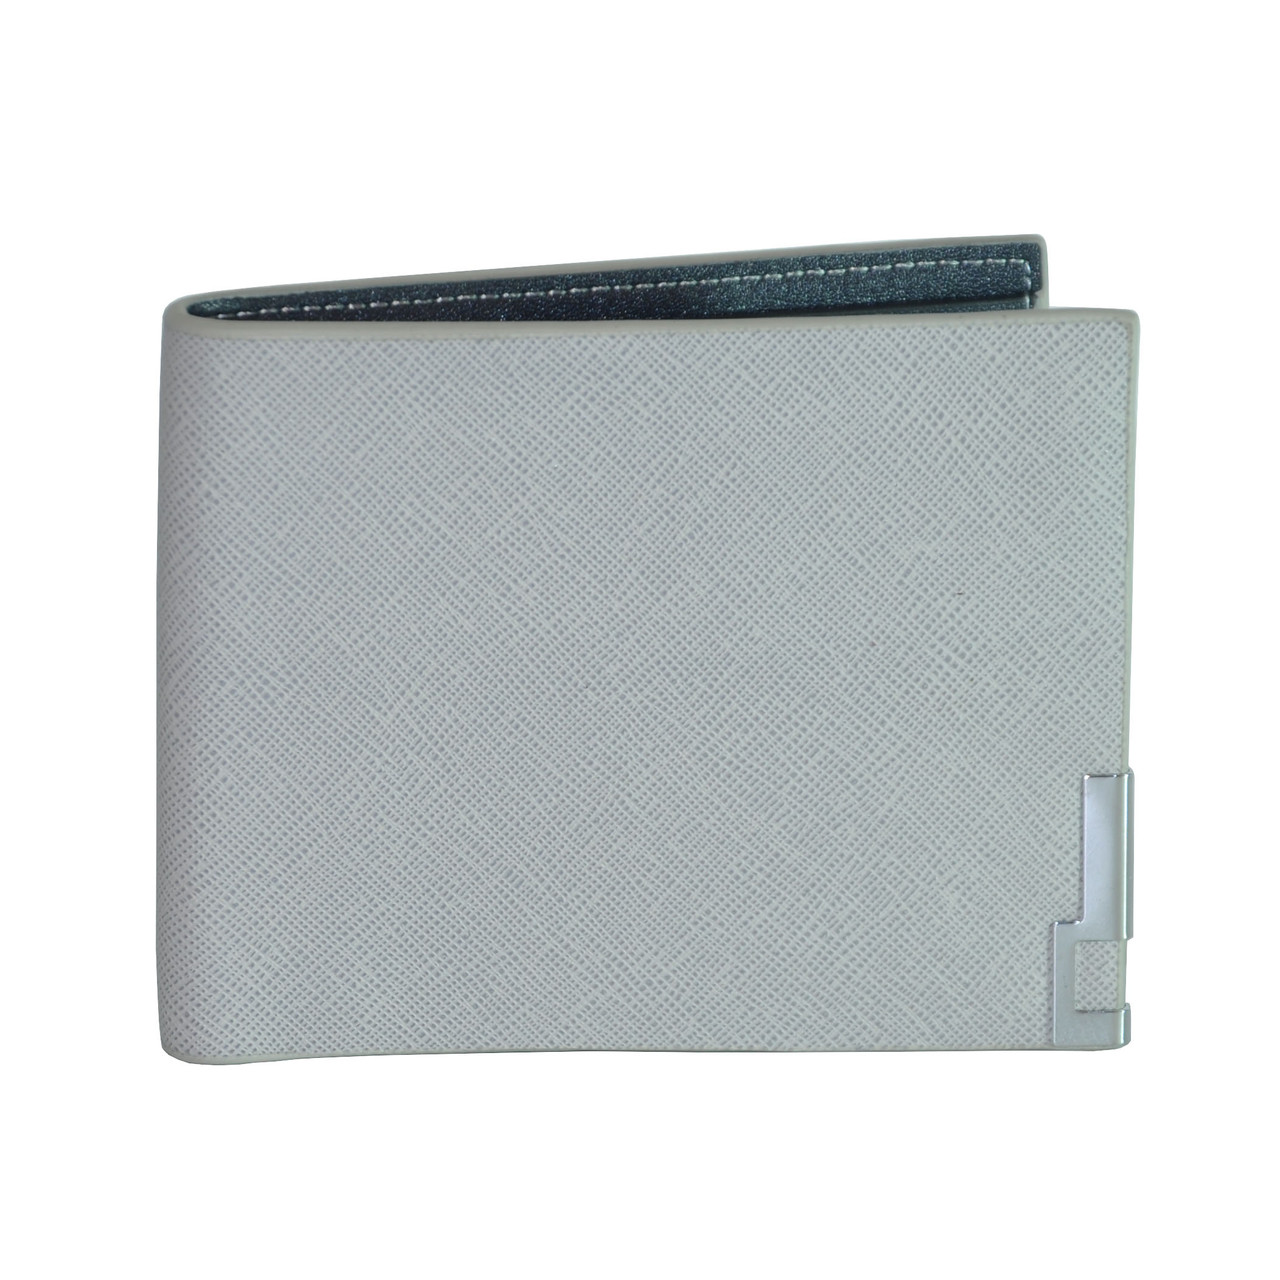 Мужской кошелек Baellerry Minimalist Safyan серый - Интернет магазин